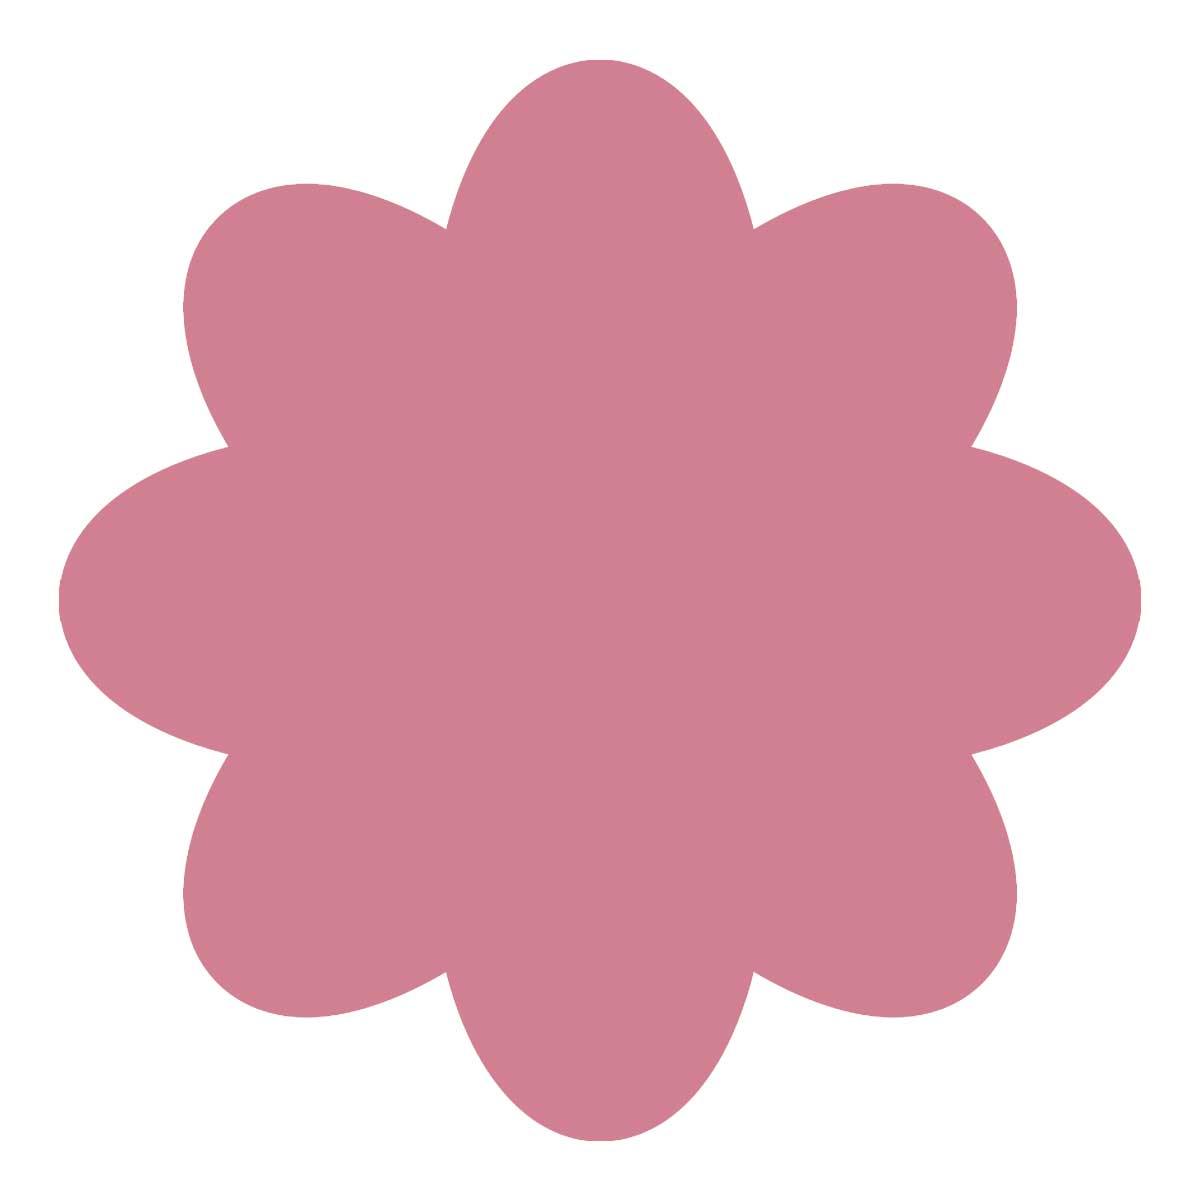 Delta Ceramcoat ® Acrylic Paint - Fuchsia Pearl, 2 oz. - 026220202W